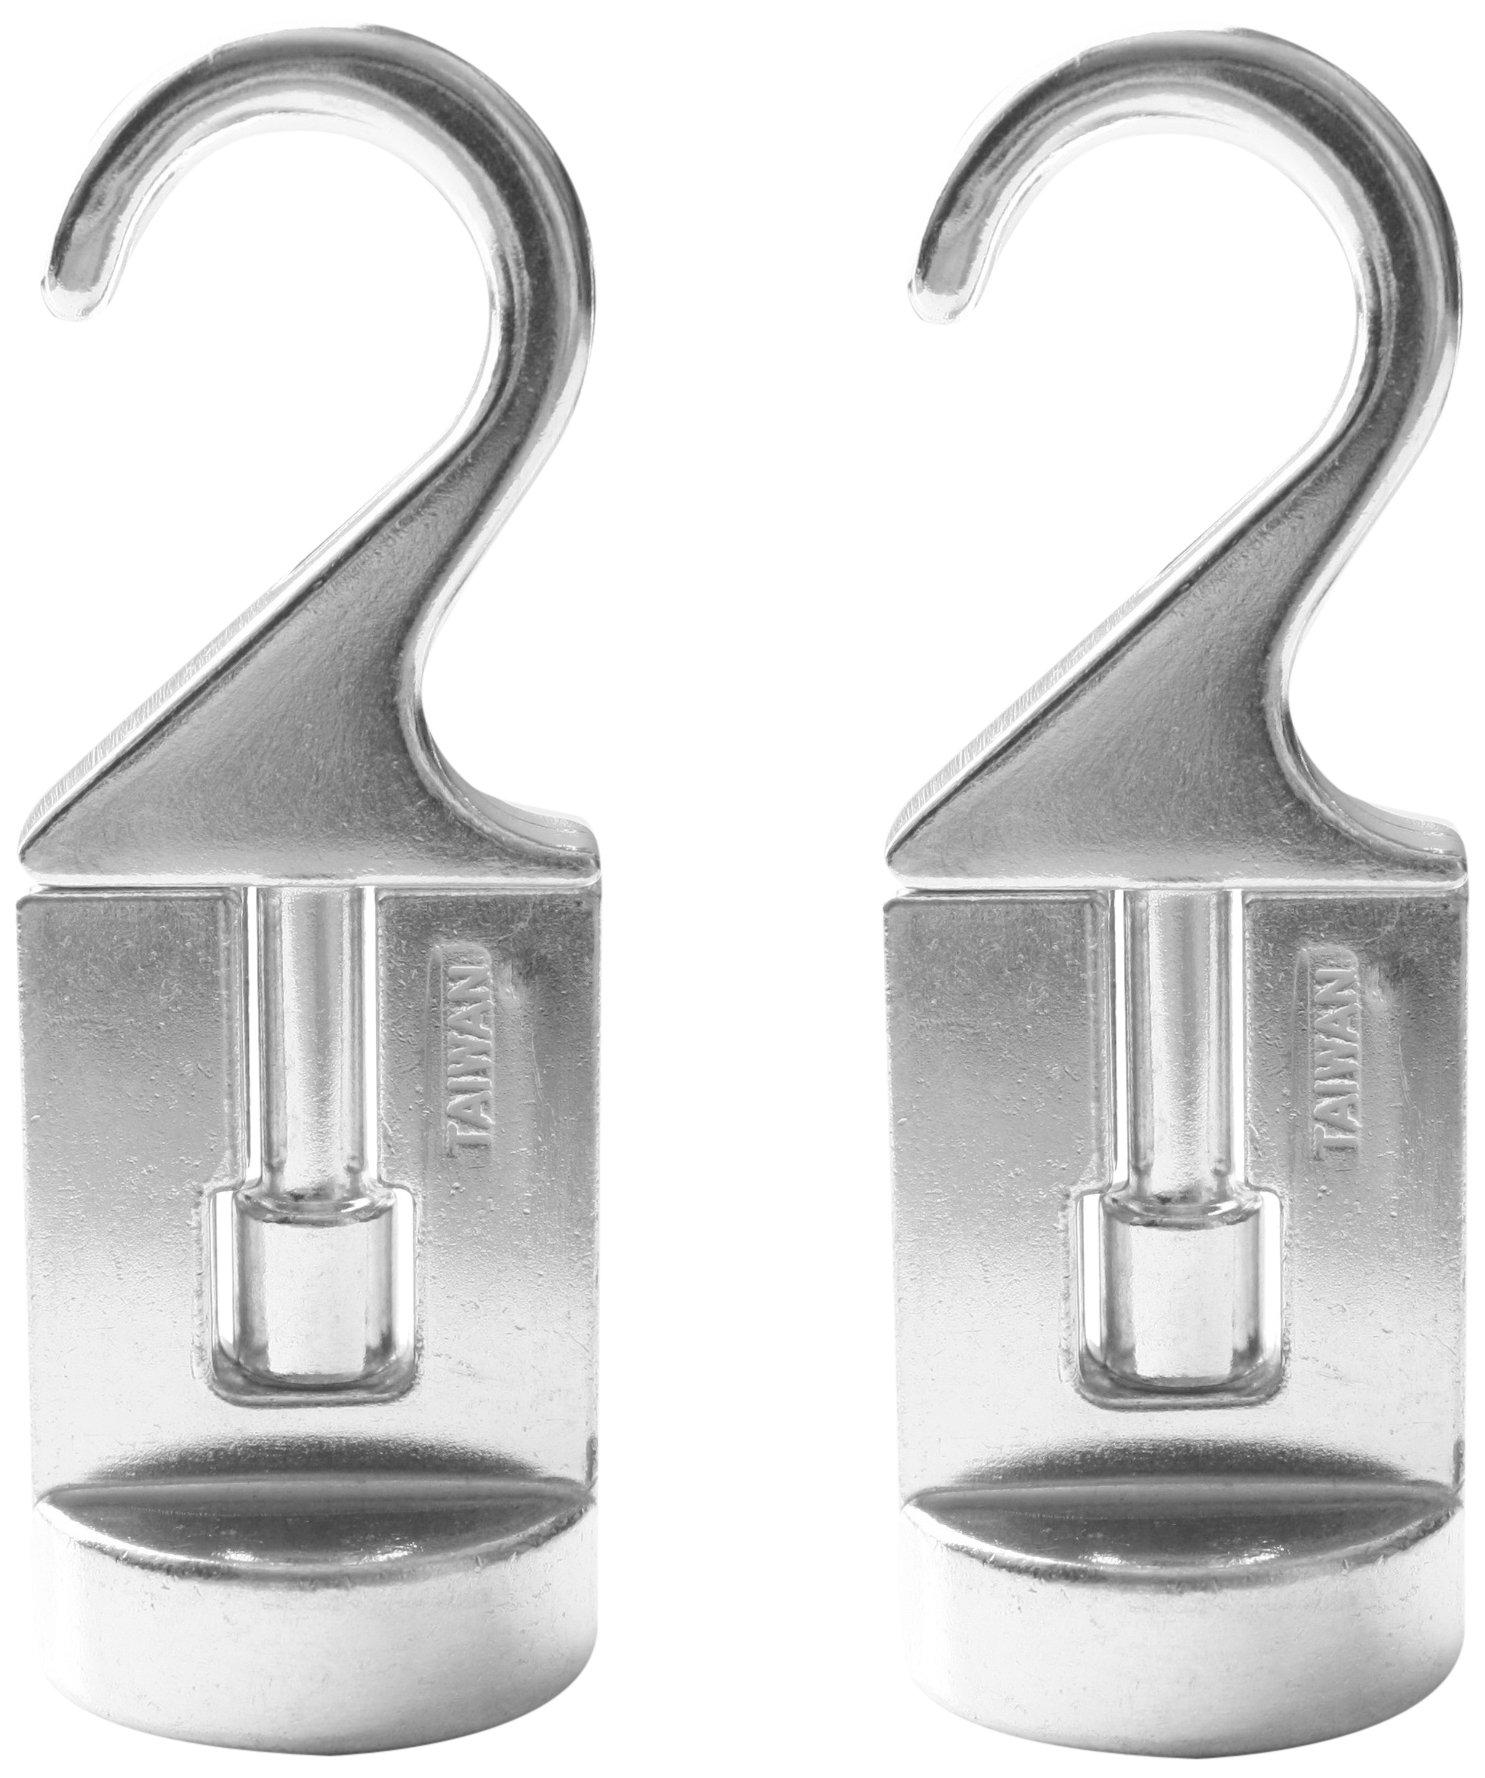 Cooks Standard Swivel Pot Rack Solid Cast Swivel Hooks, Set of 2